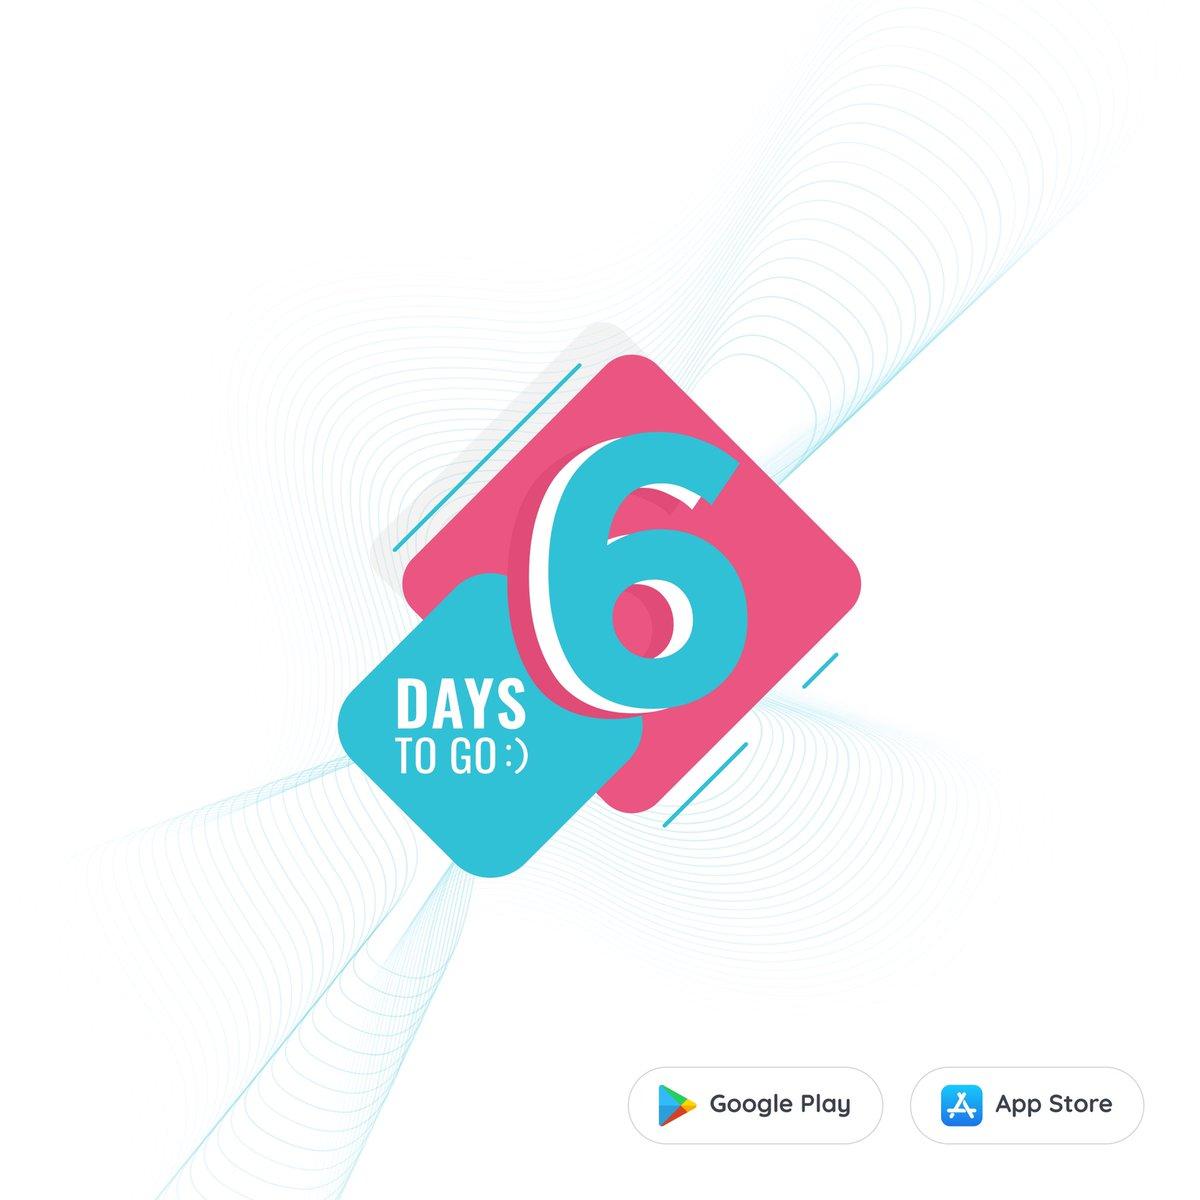 🤩6 days to go 📲  #doppelmate #birthday #twins #friends #friendship #love #socialnetwork #newapp #knowledge #experience